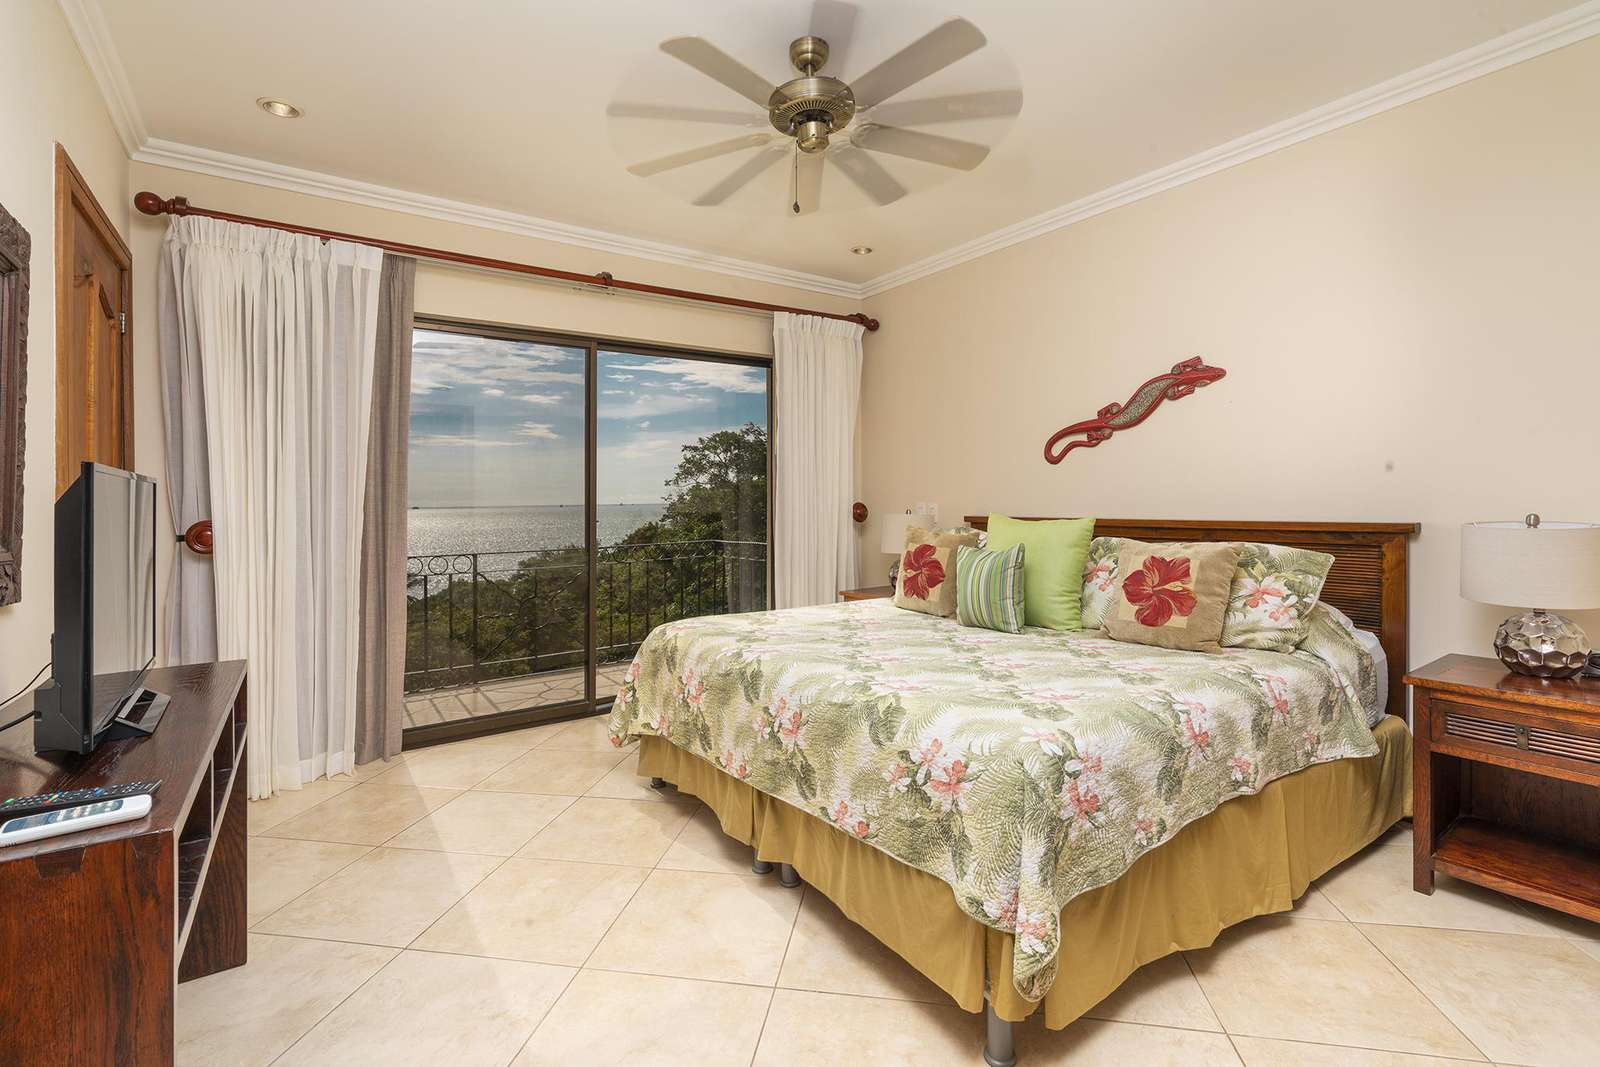 Master bedroom, King bed, ocean views, full private bathroom with walk in shower